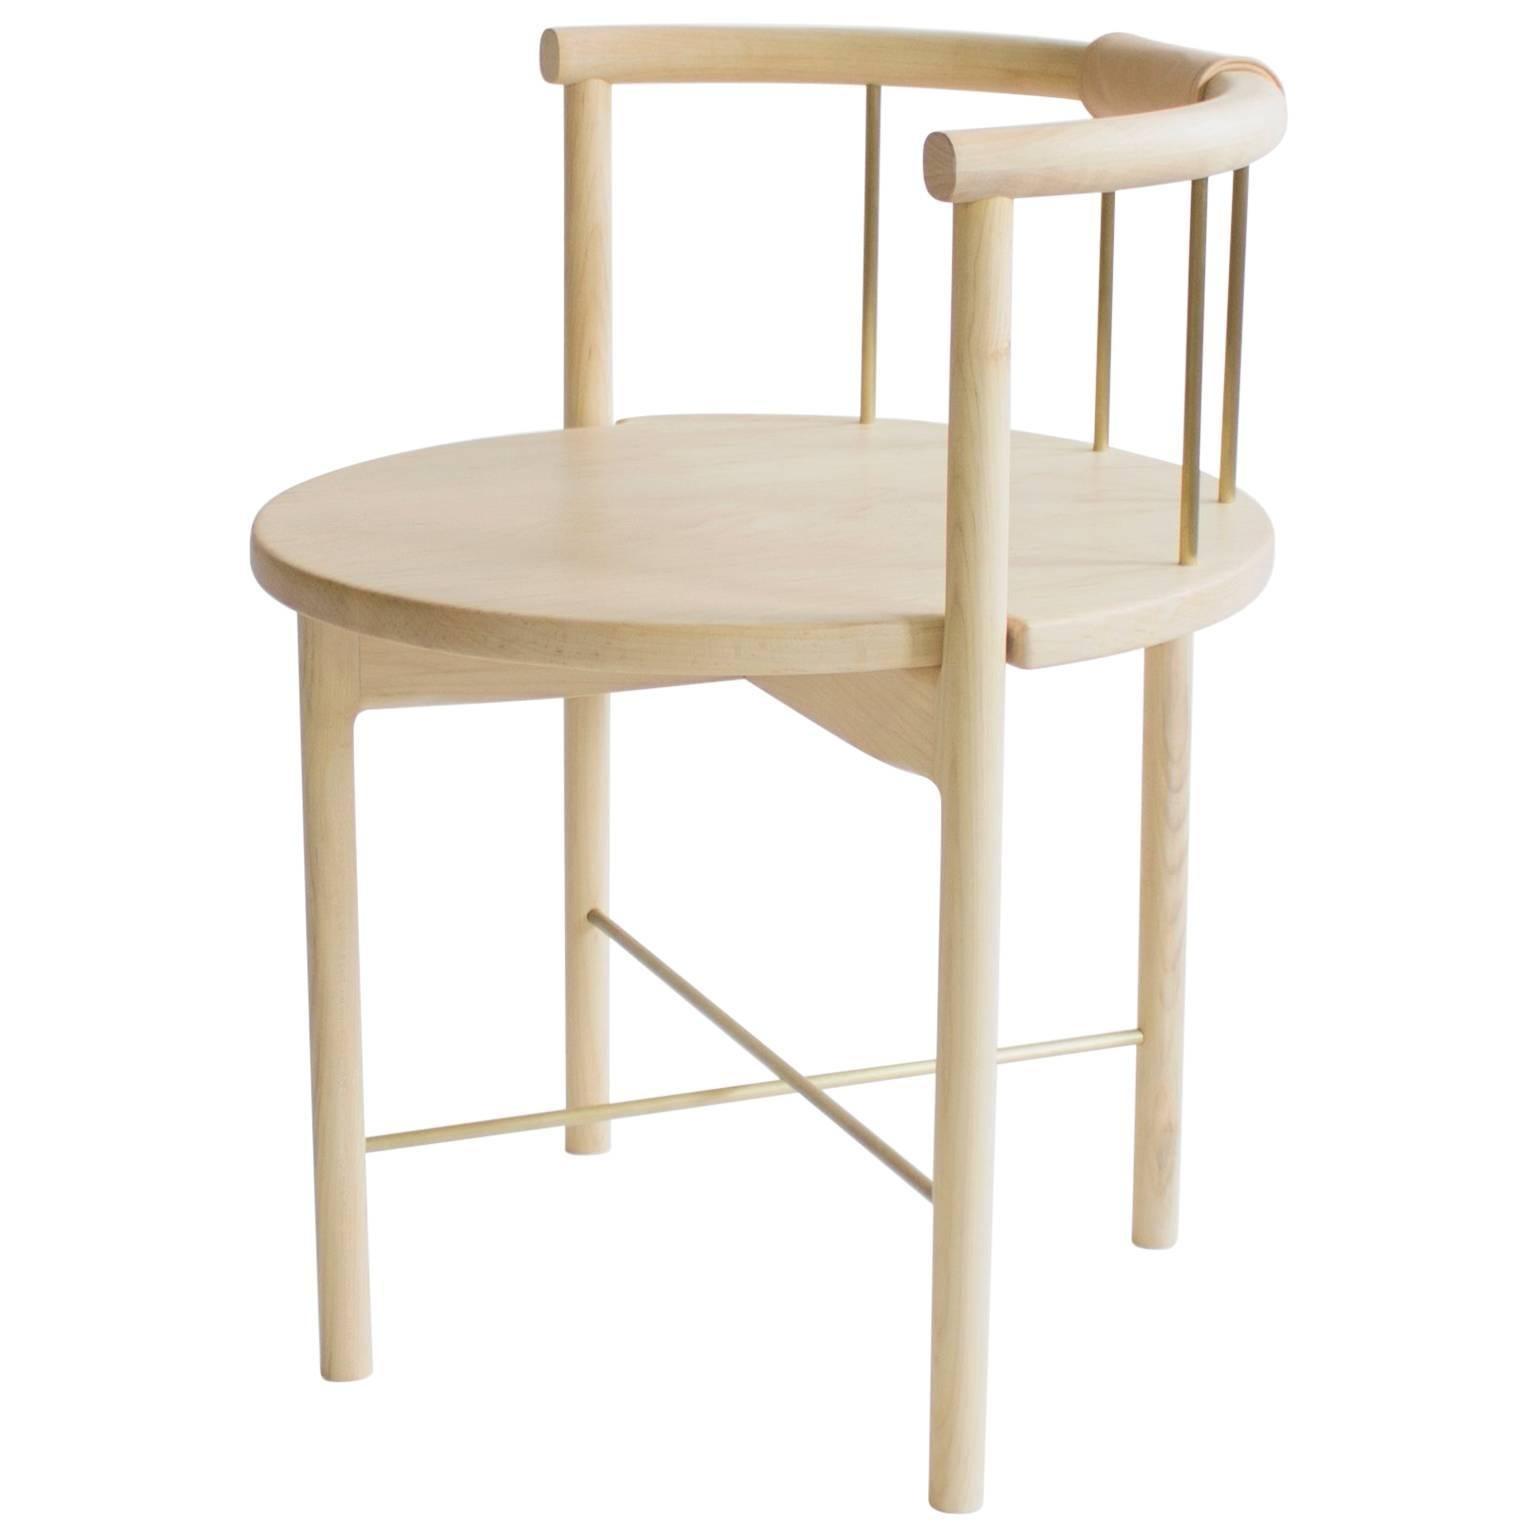 Lloyd Modern Dinning, Accent Chair, Barrel Back